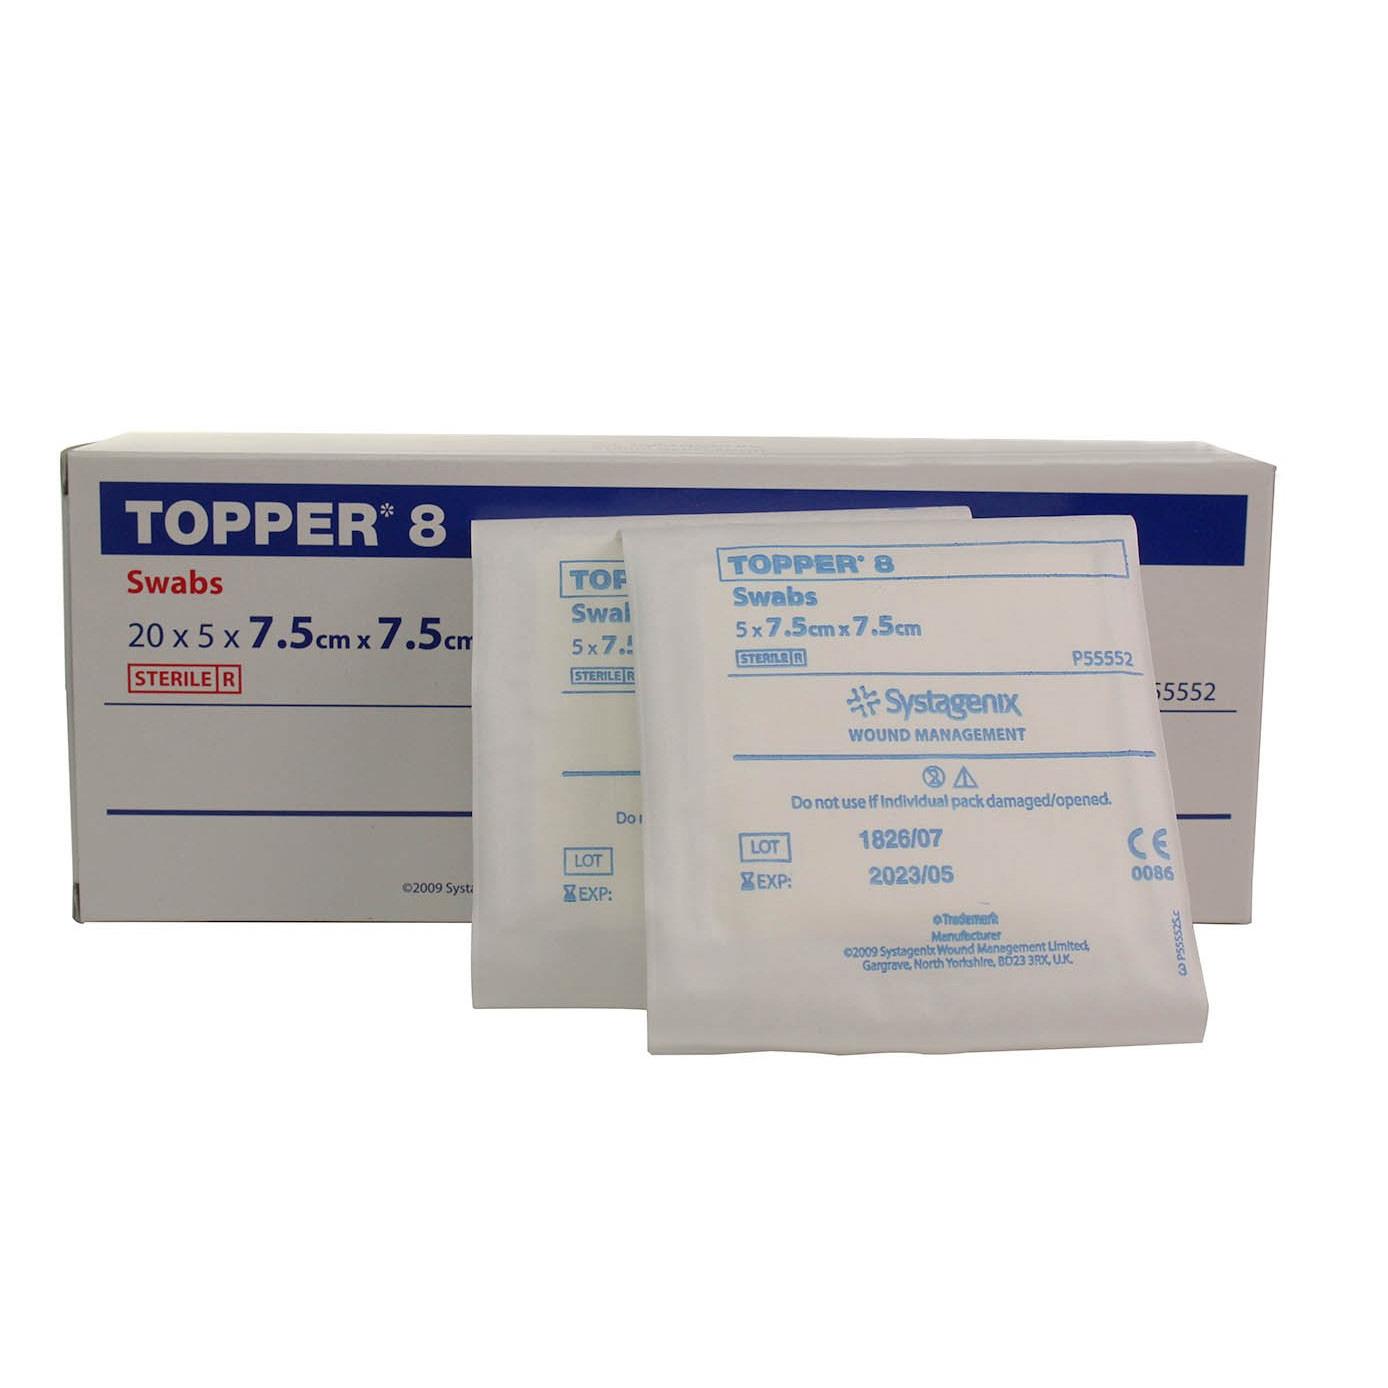 Topper 8 Swabs Sterile 7.5cm